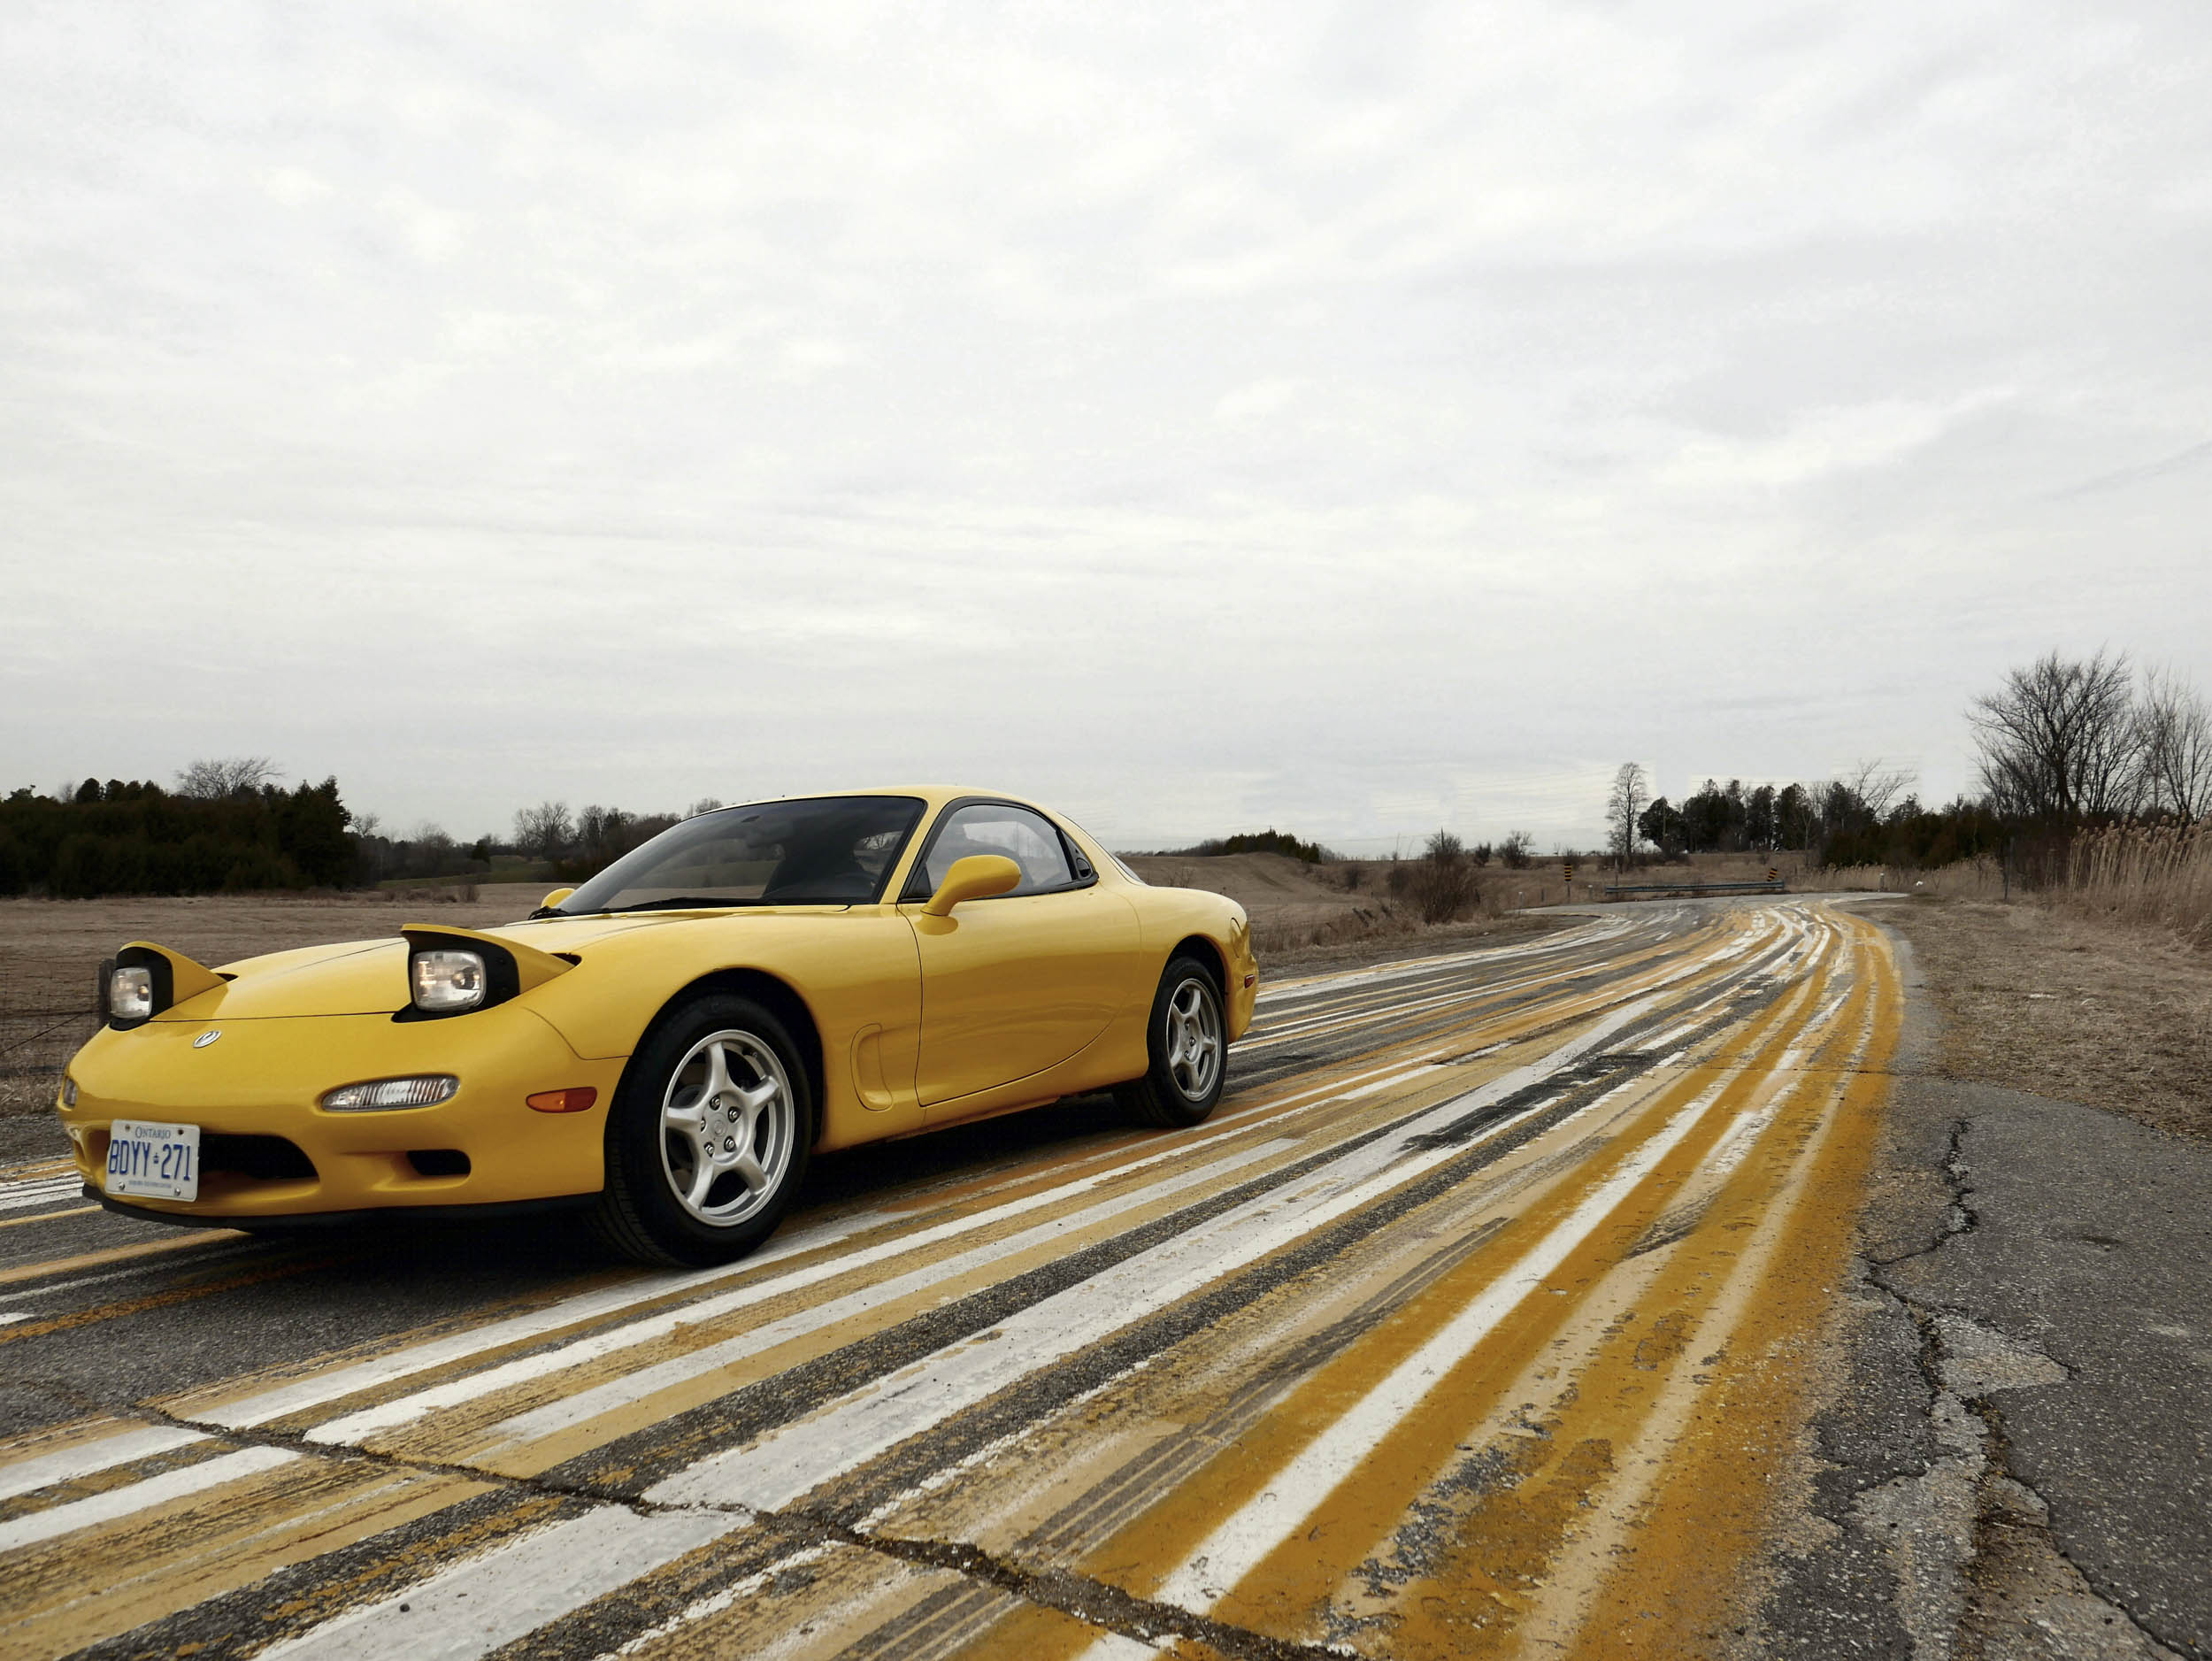 yellow 1993 Mazda RX-7